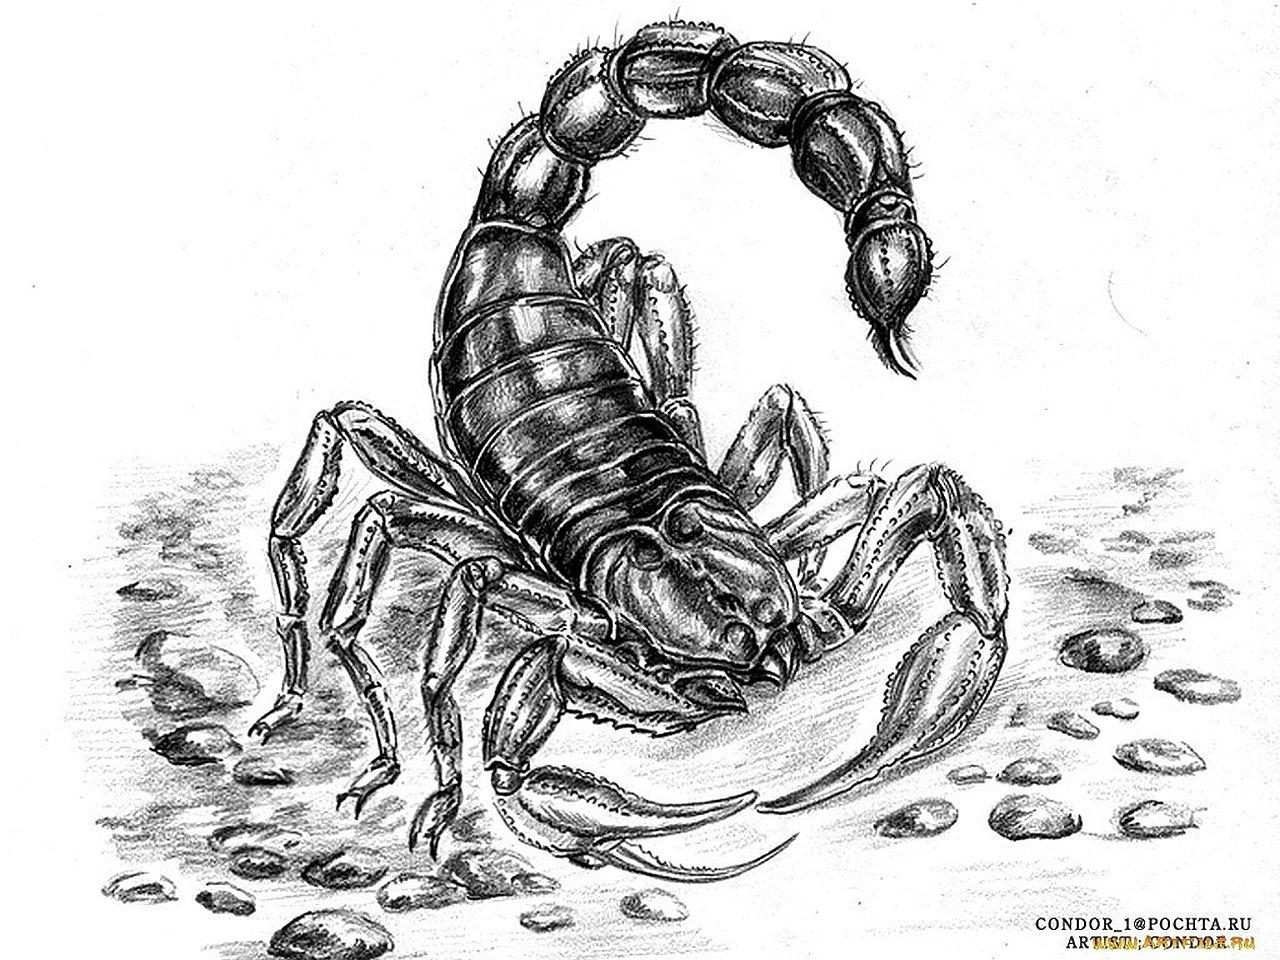 19 Scorpion HD Wallpapers